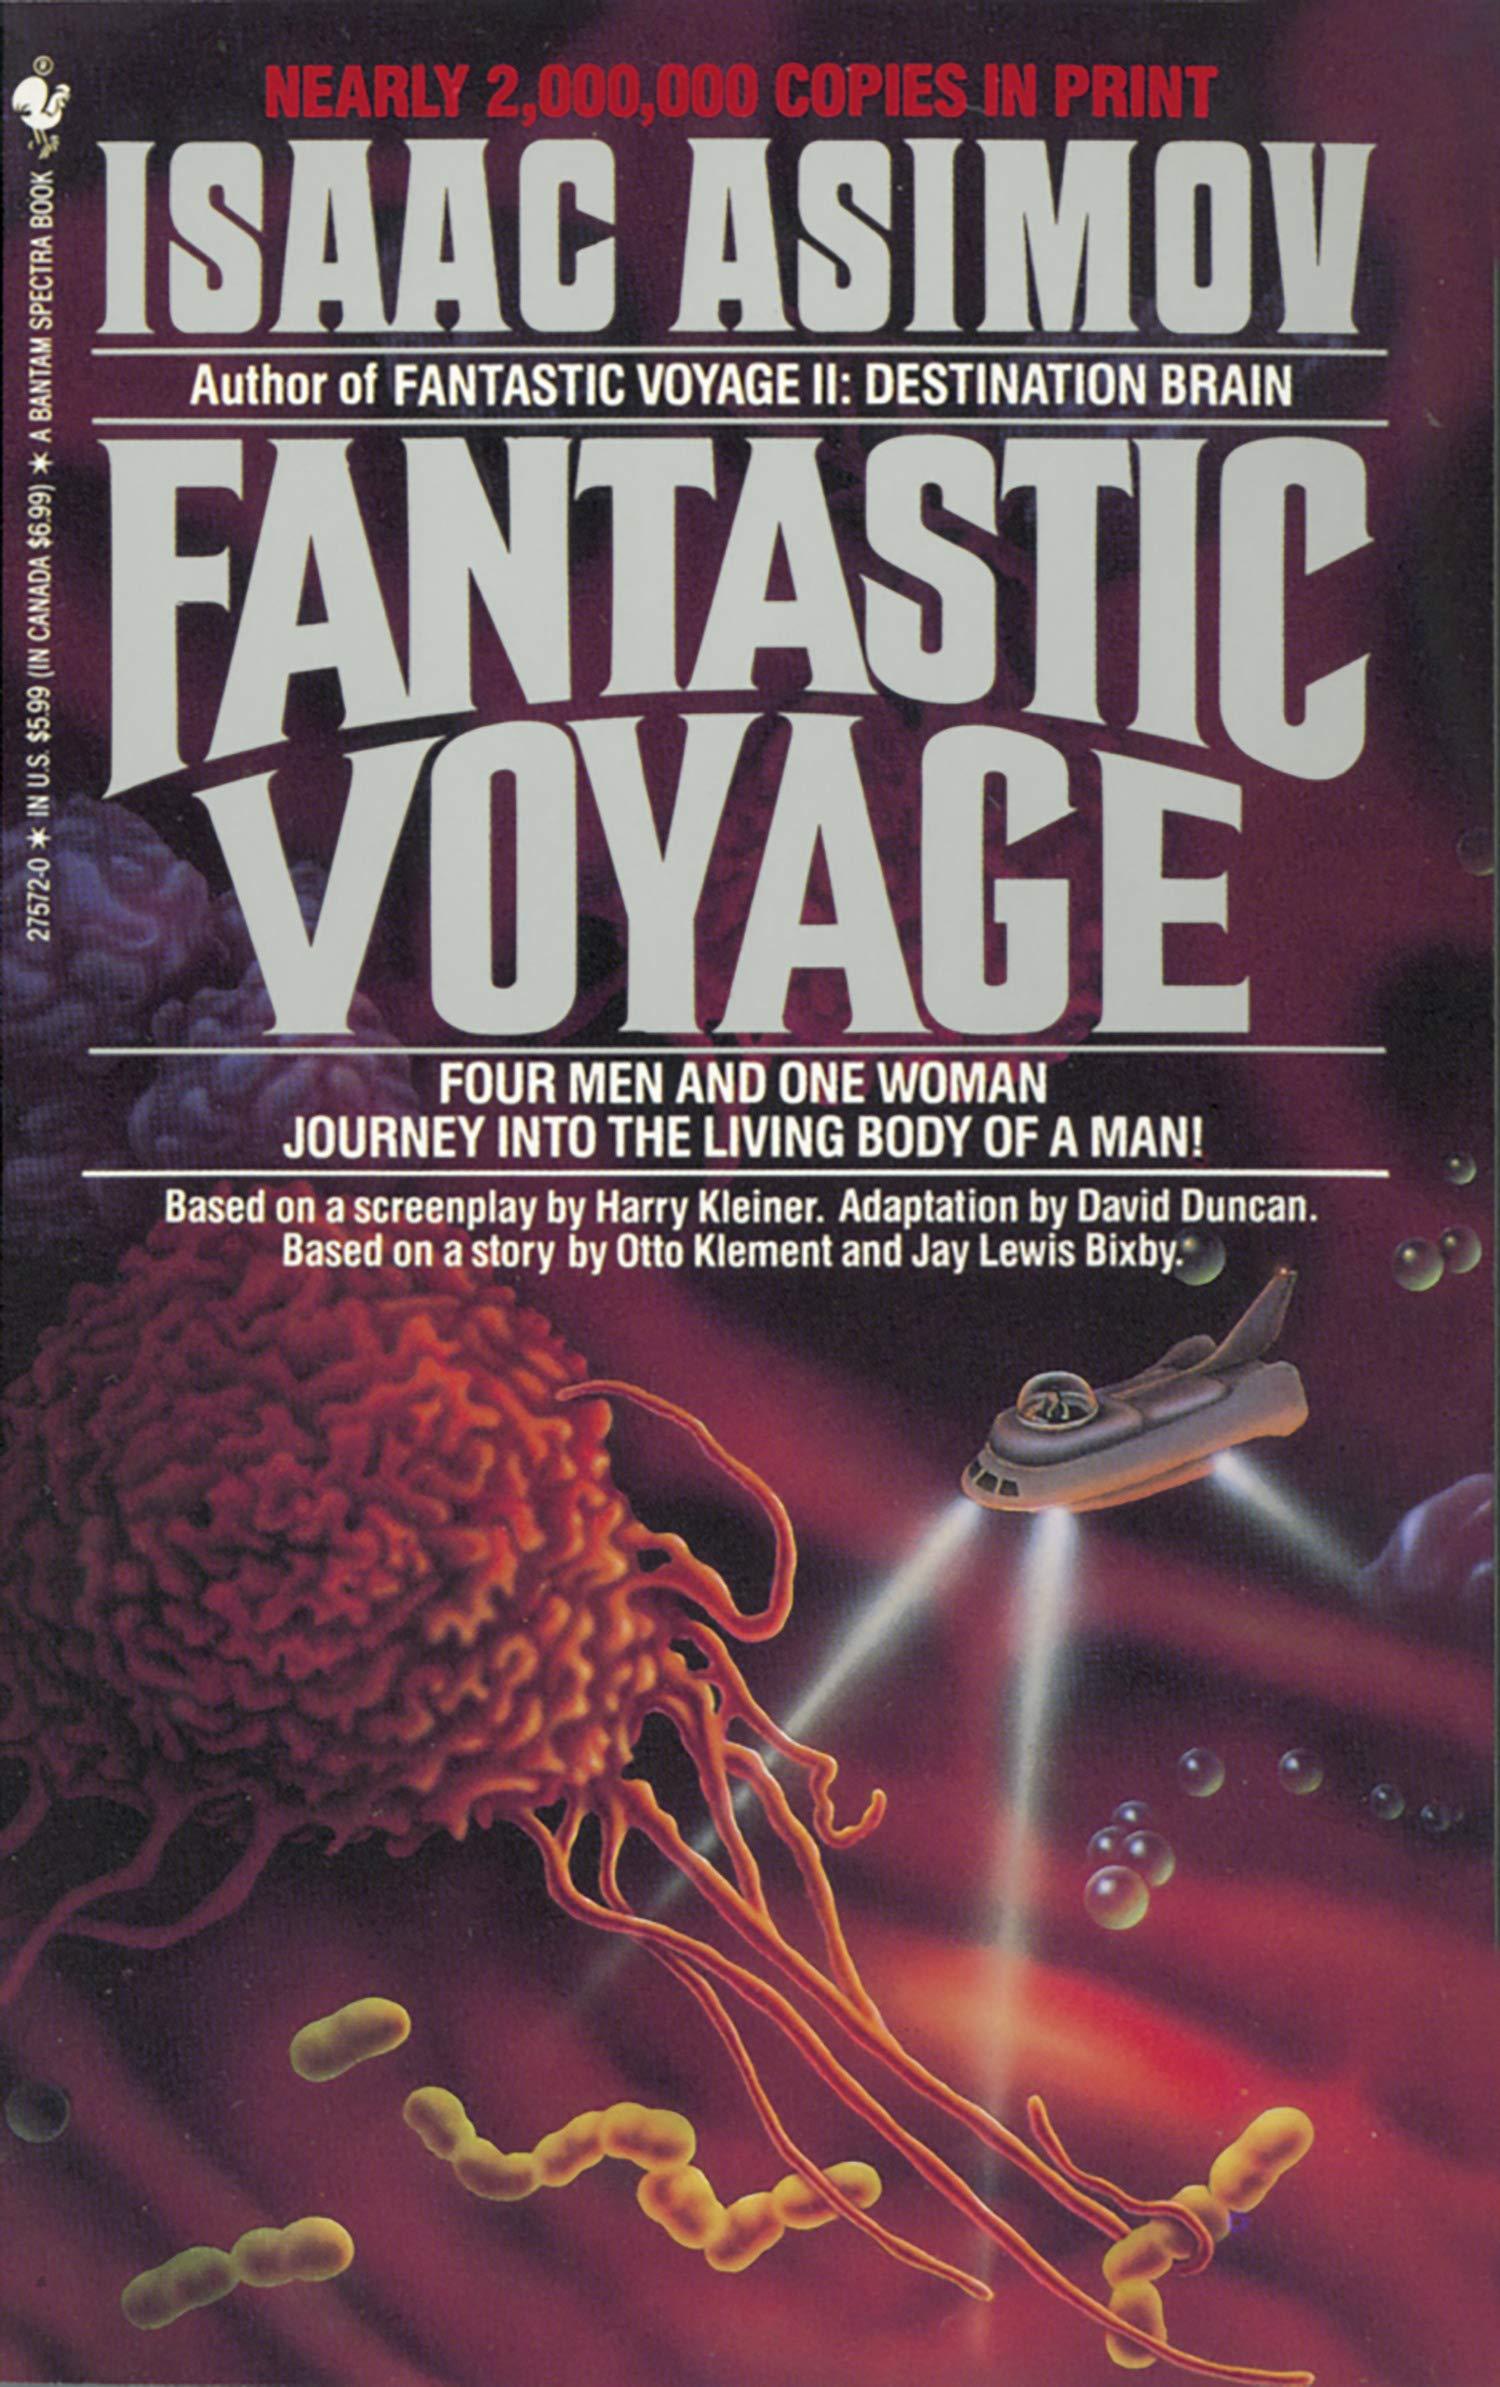 Amazon Com Fantastic Voyage A Novel 9780553275728 Isaac Asimov